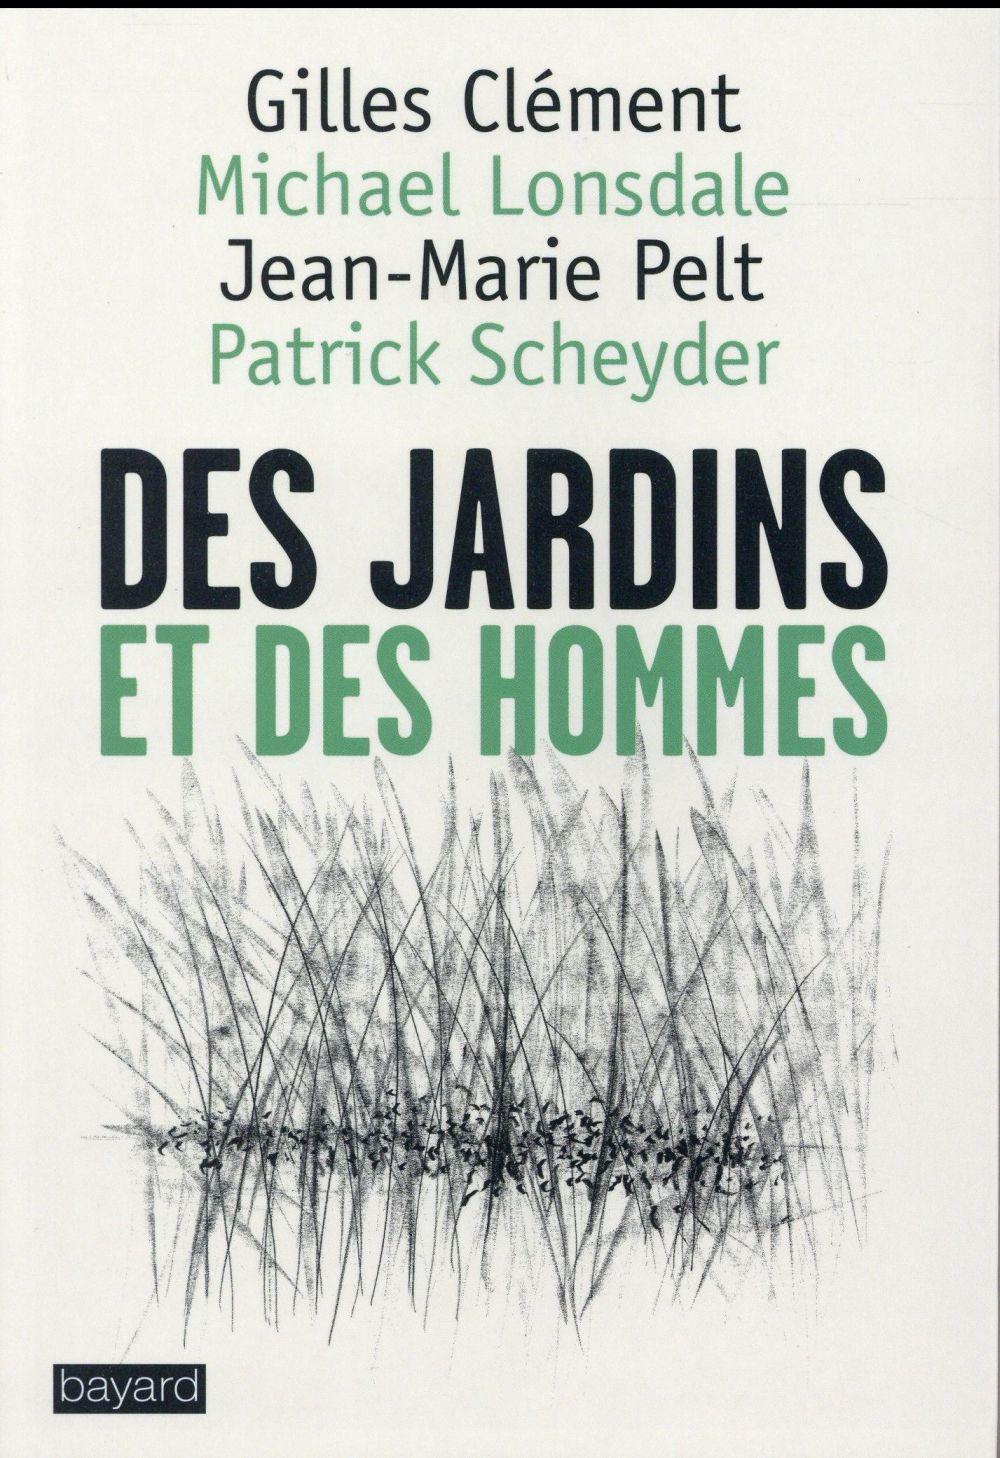 DES JARDINS ET DES HOMMES